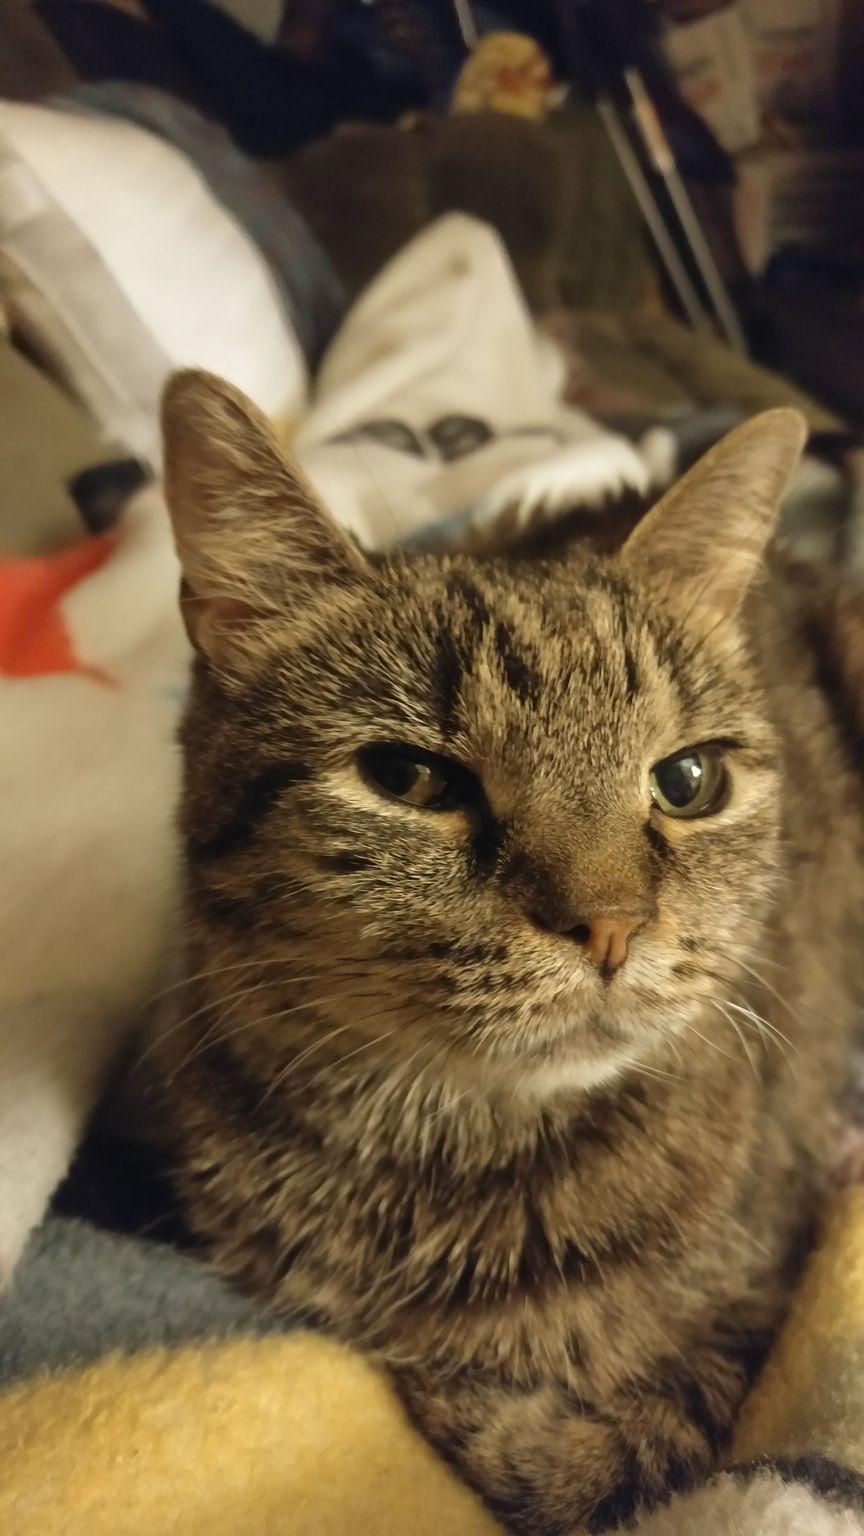 Kitty on my lap http://ift.tt/2grwAvq